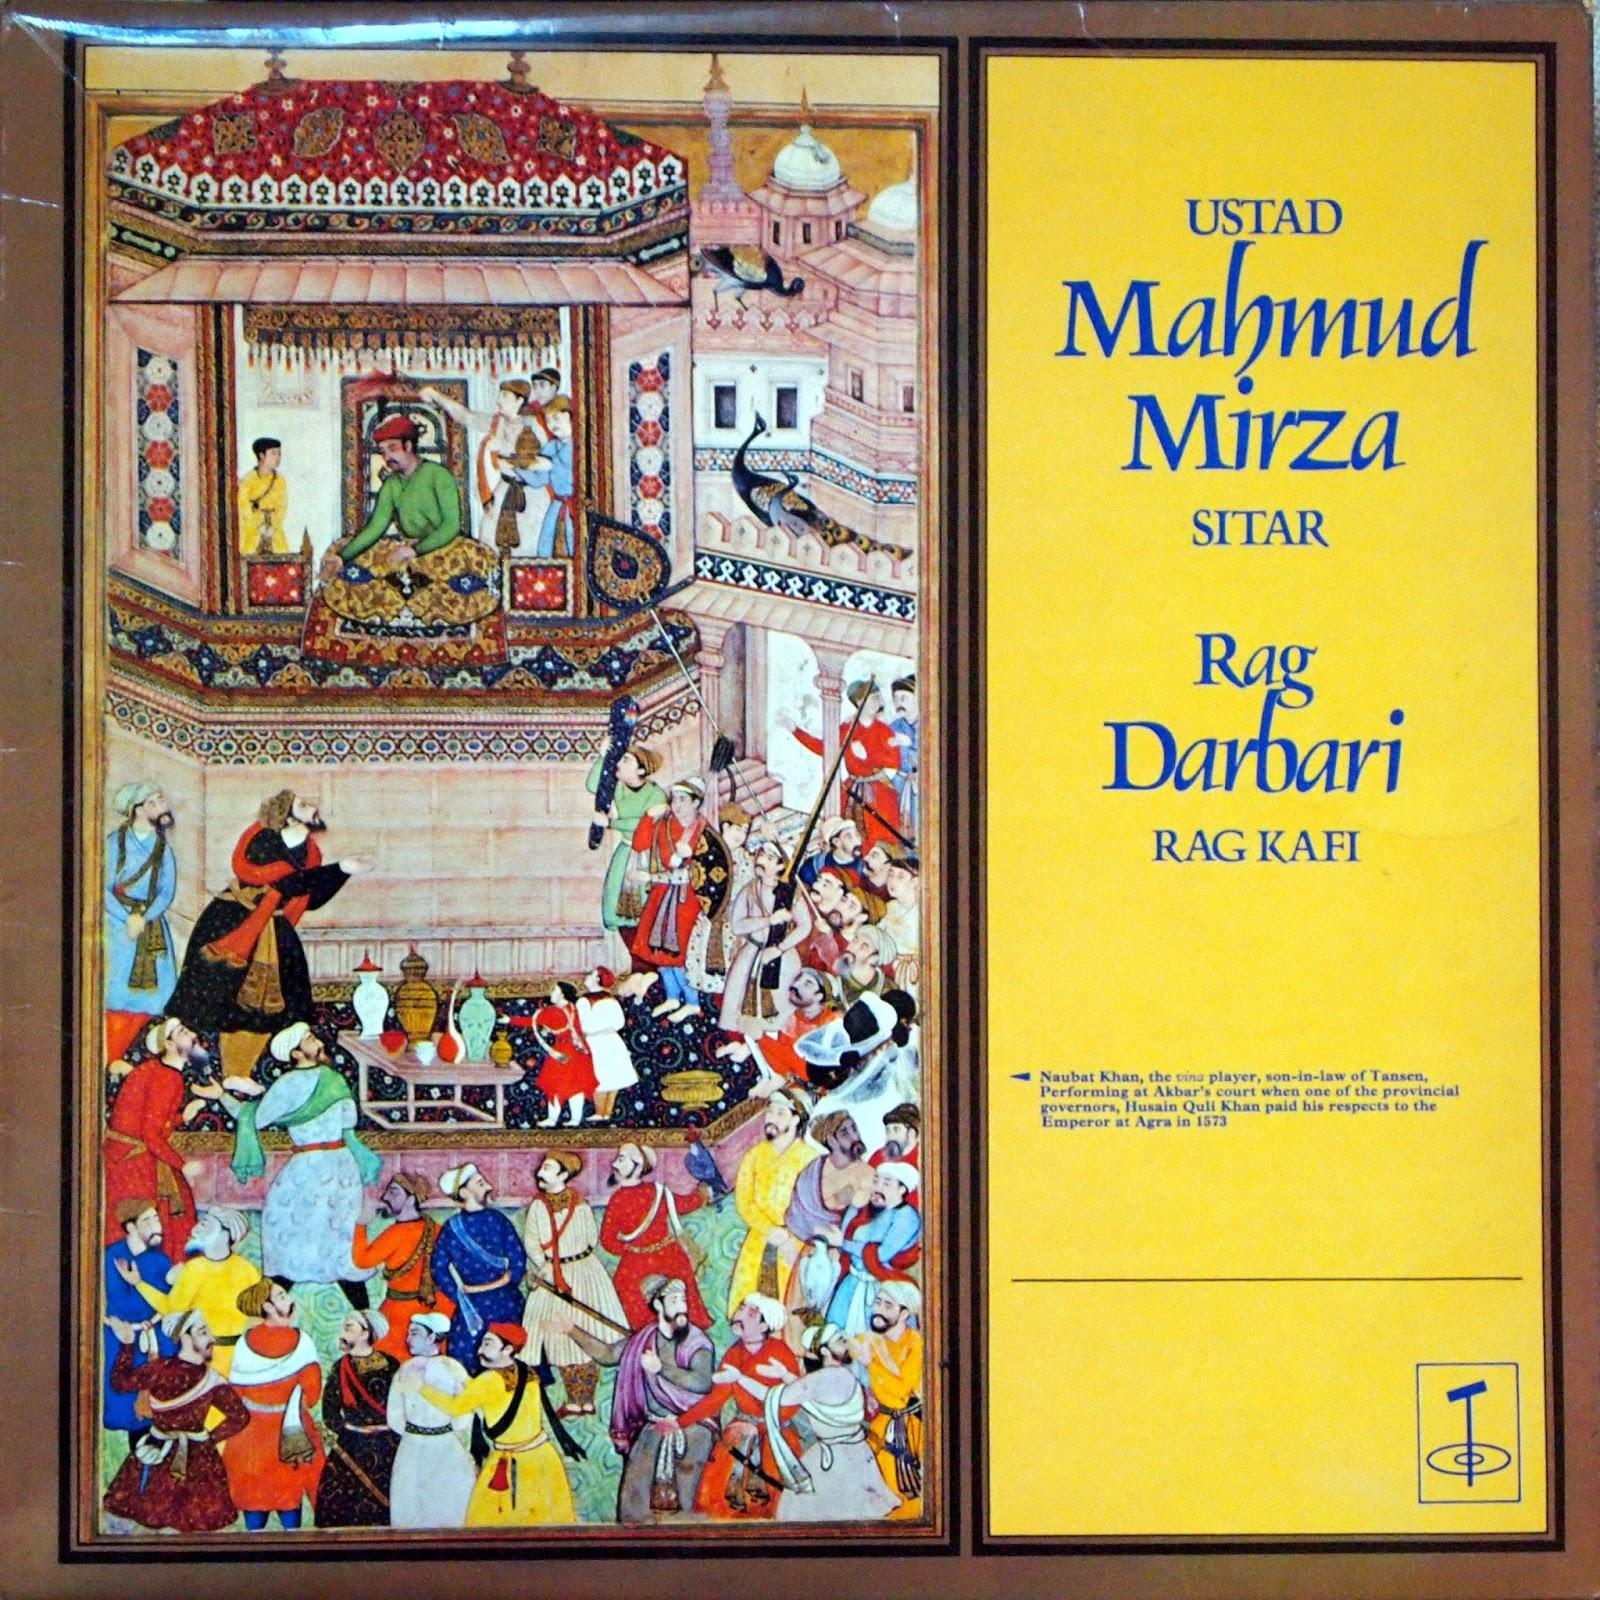 Ustad Mahmud Mirza - Rag Darbari